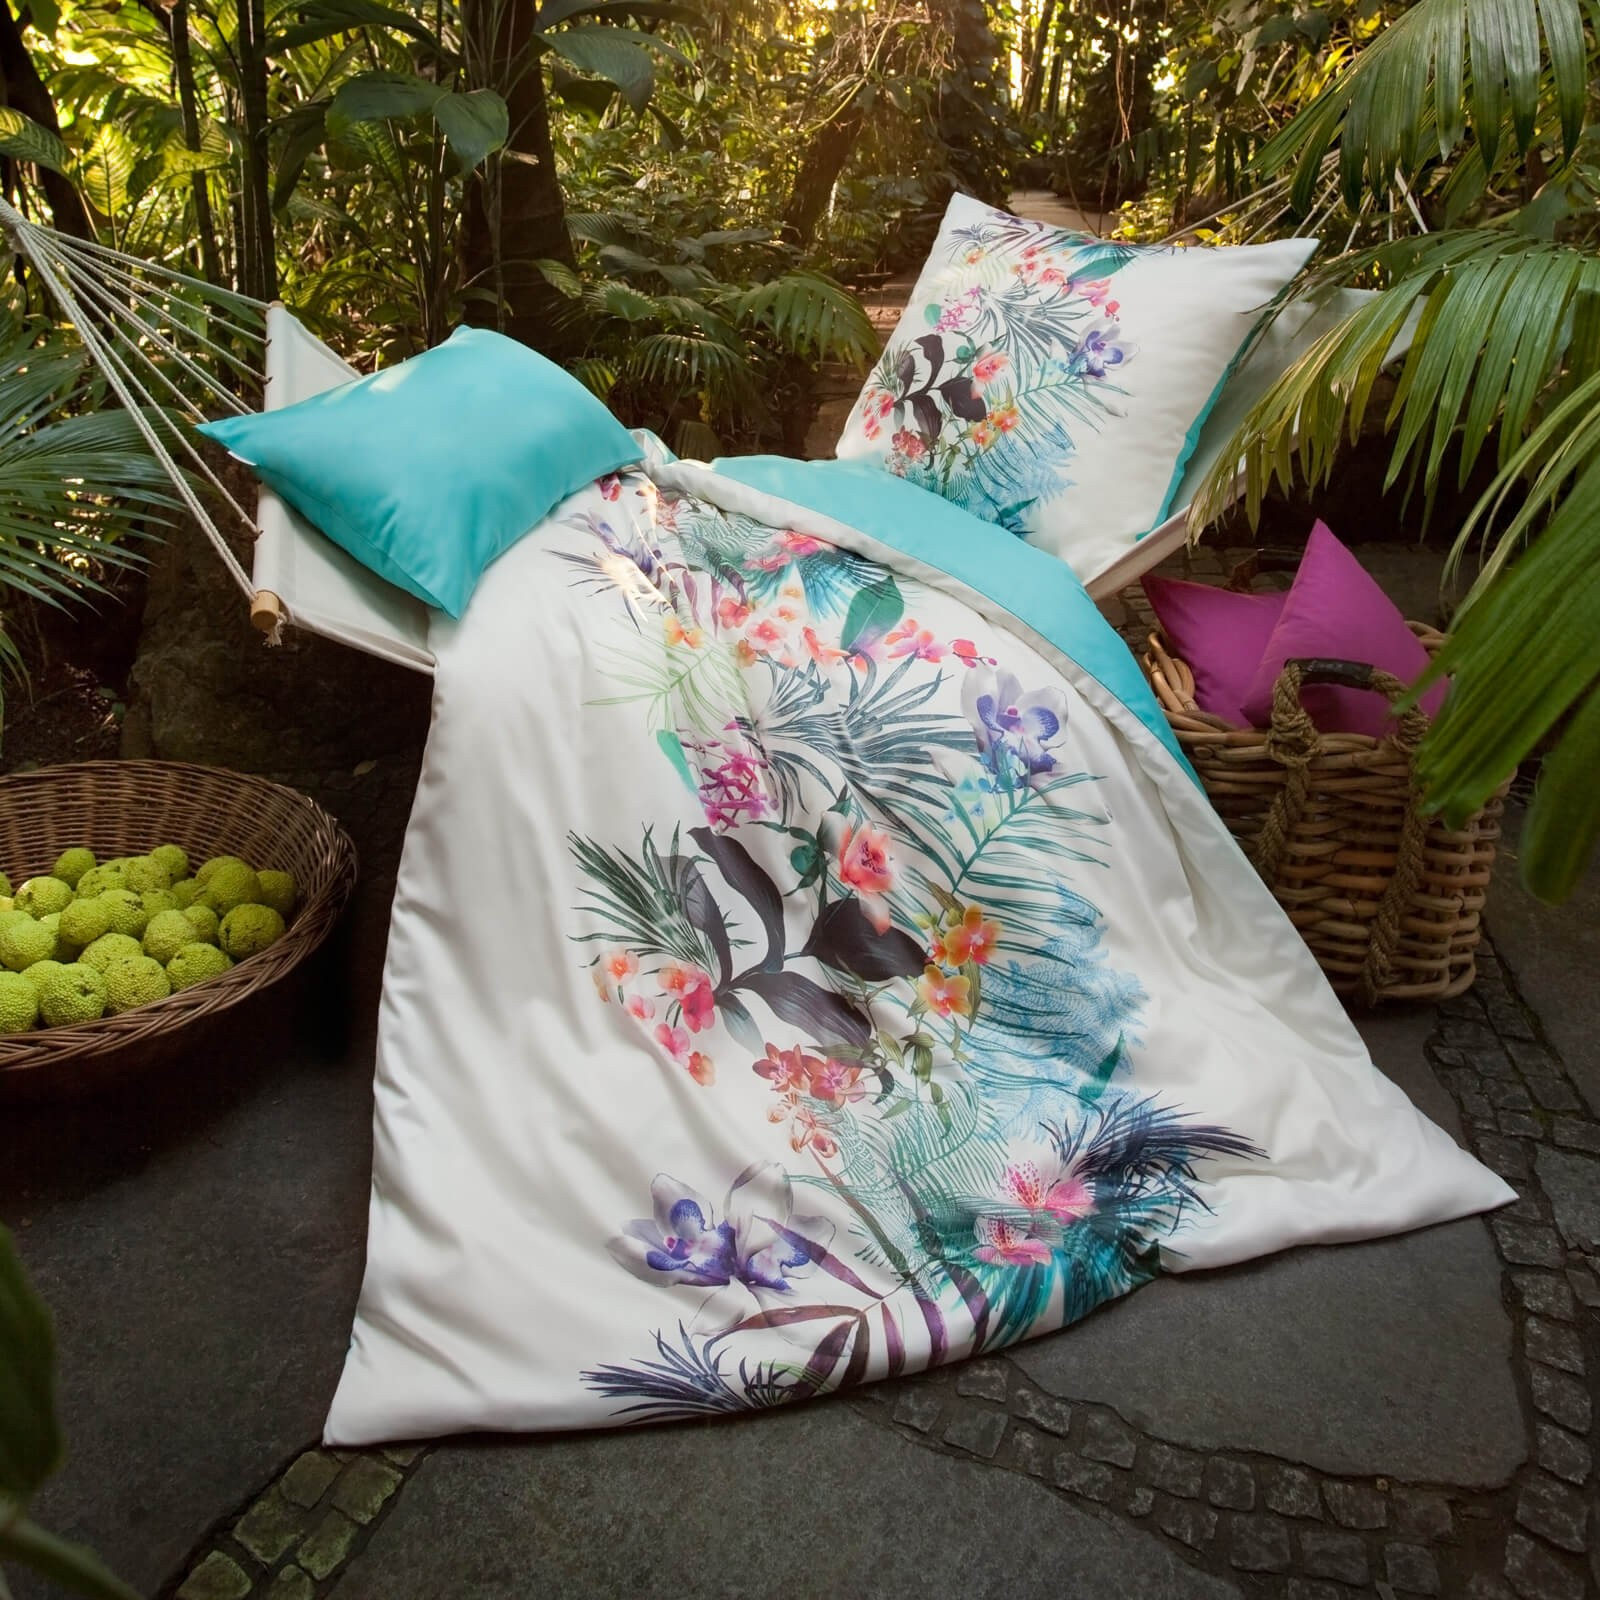 bettwsche estella elegant estella interlock jersey bettwsche luke gre xx cm farbe nougat with. Black Bedroom Furniture Sets. Home Design Ideas